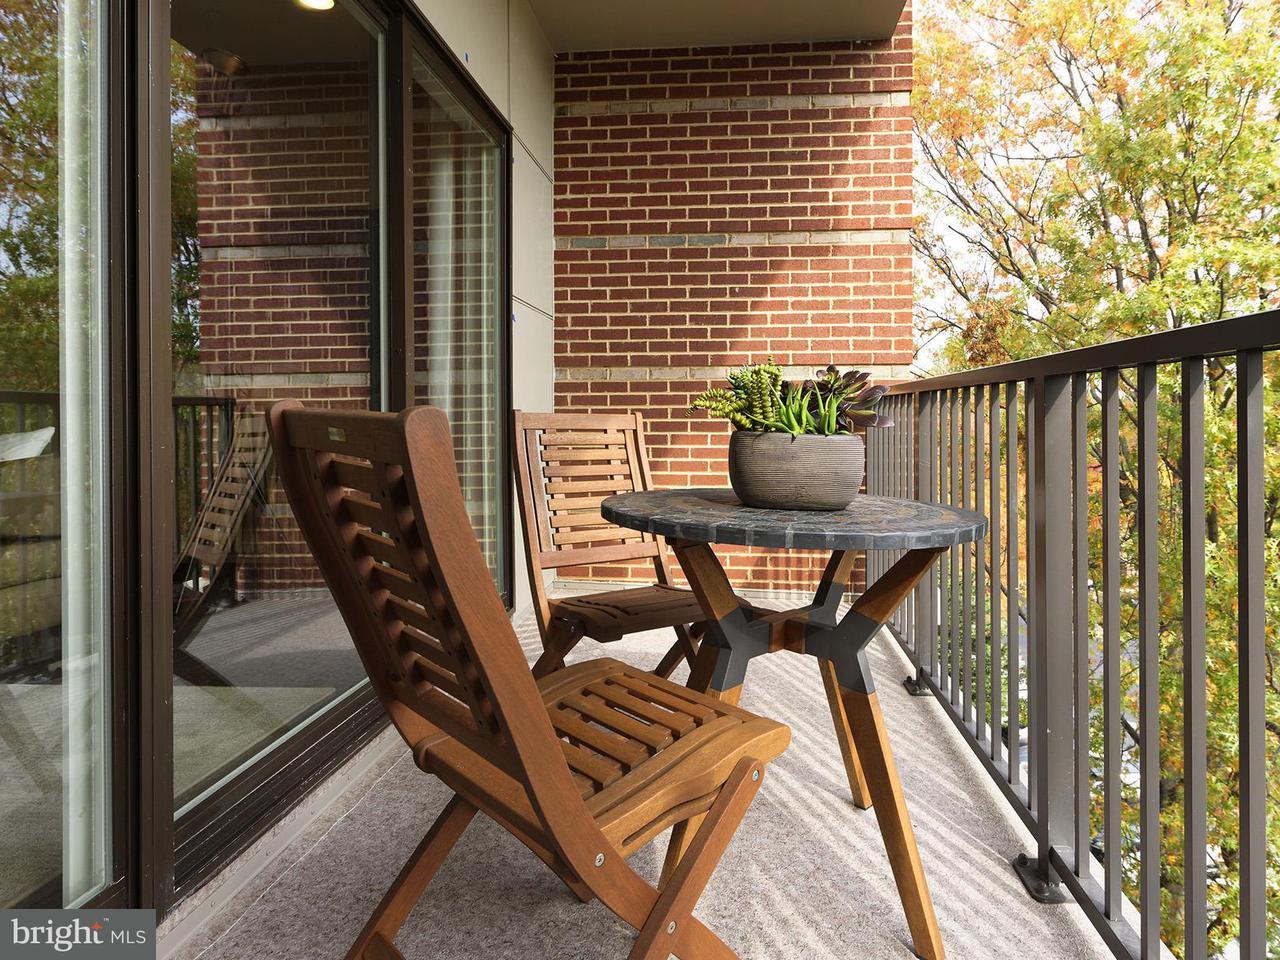 Additional photo for property listing at 3985 Norton Pl #10602 3985 Norton Pl #10602 Fairfax, 弗吉尼亞州 22030 美國